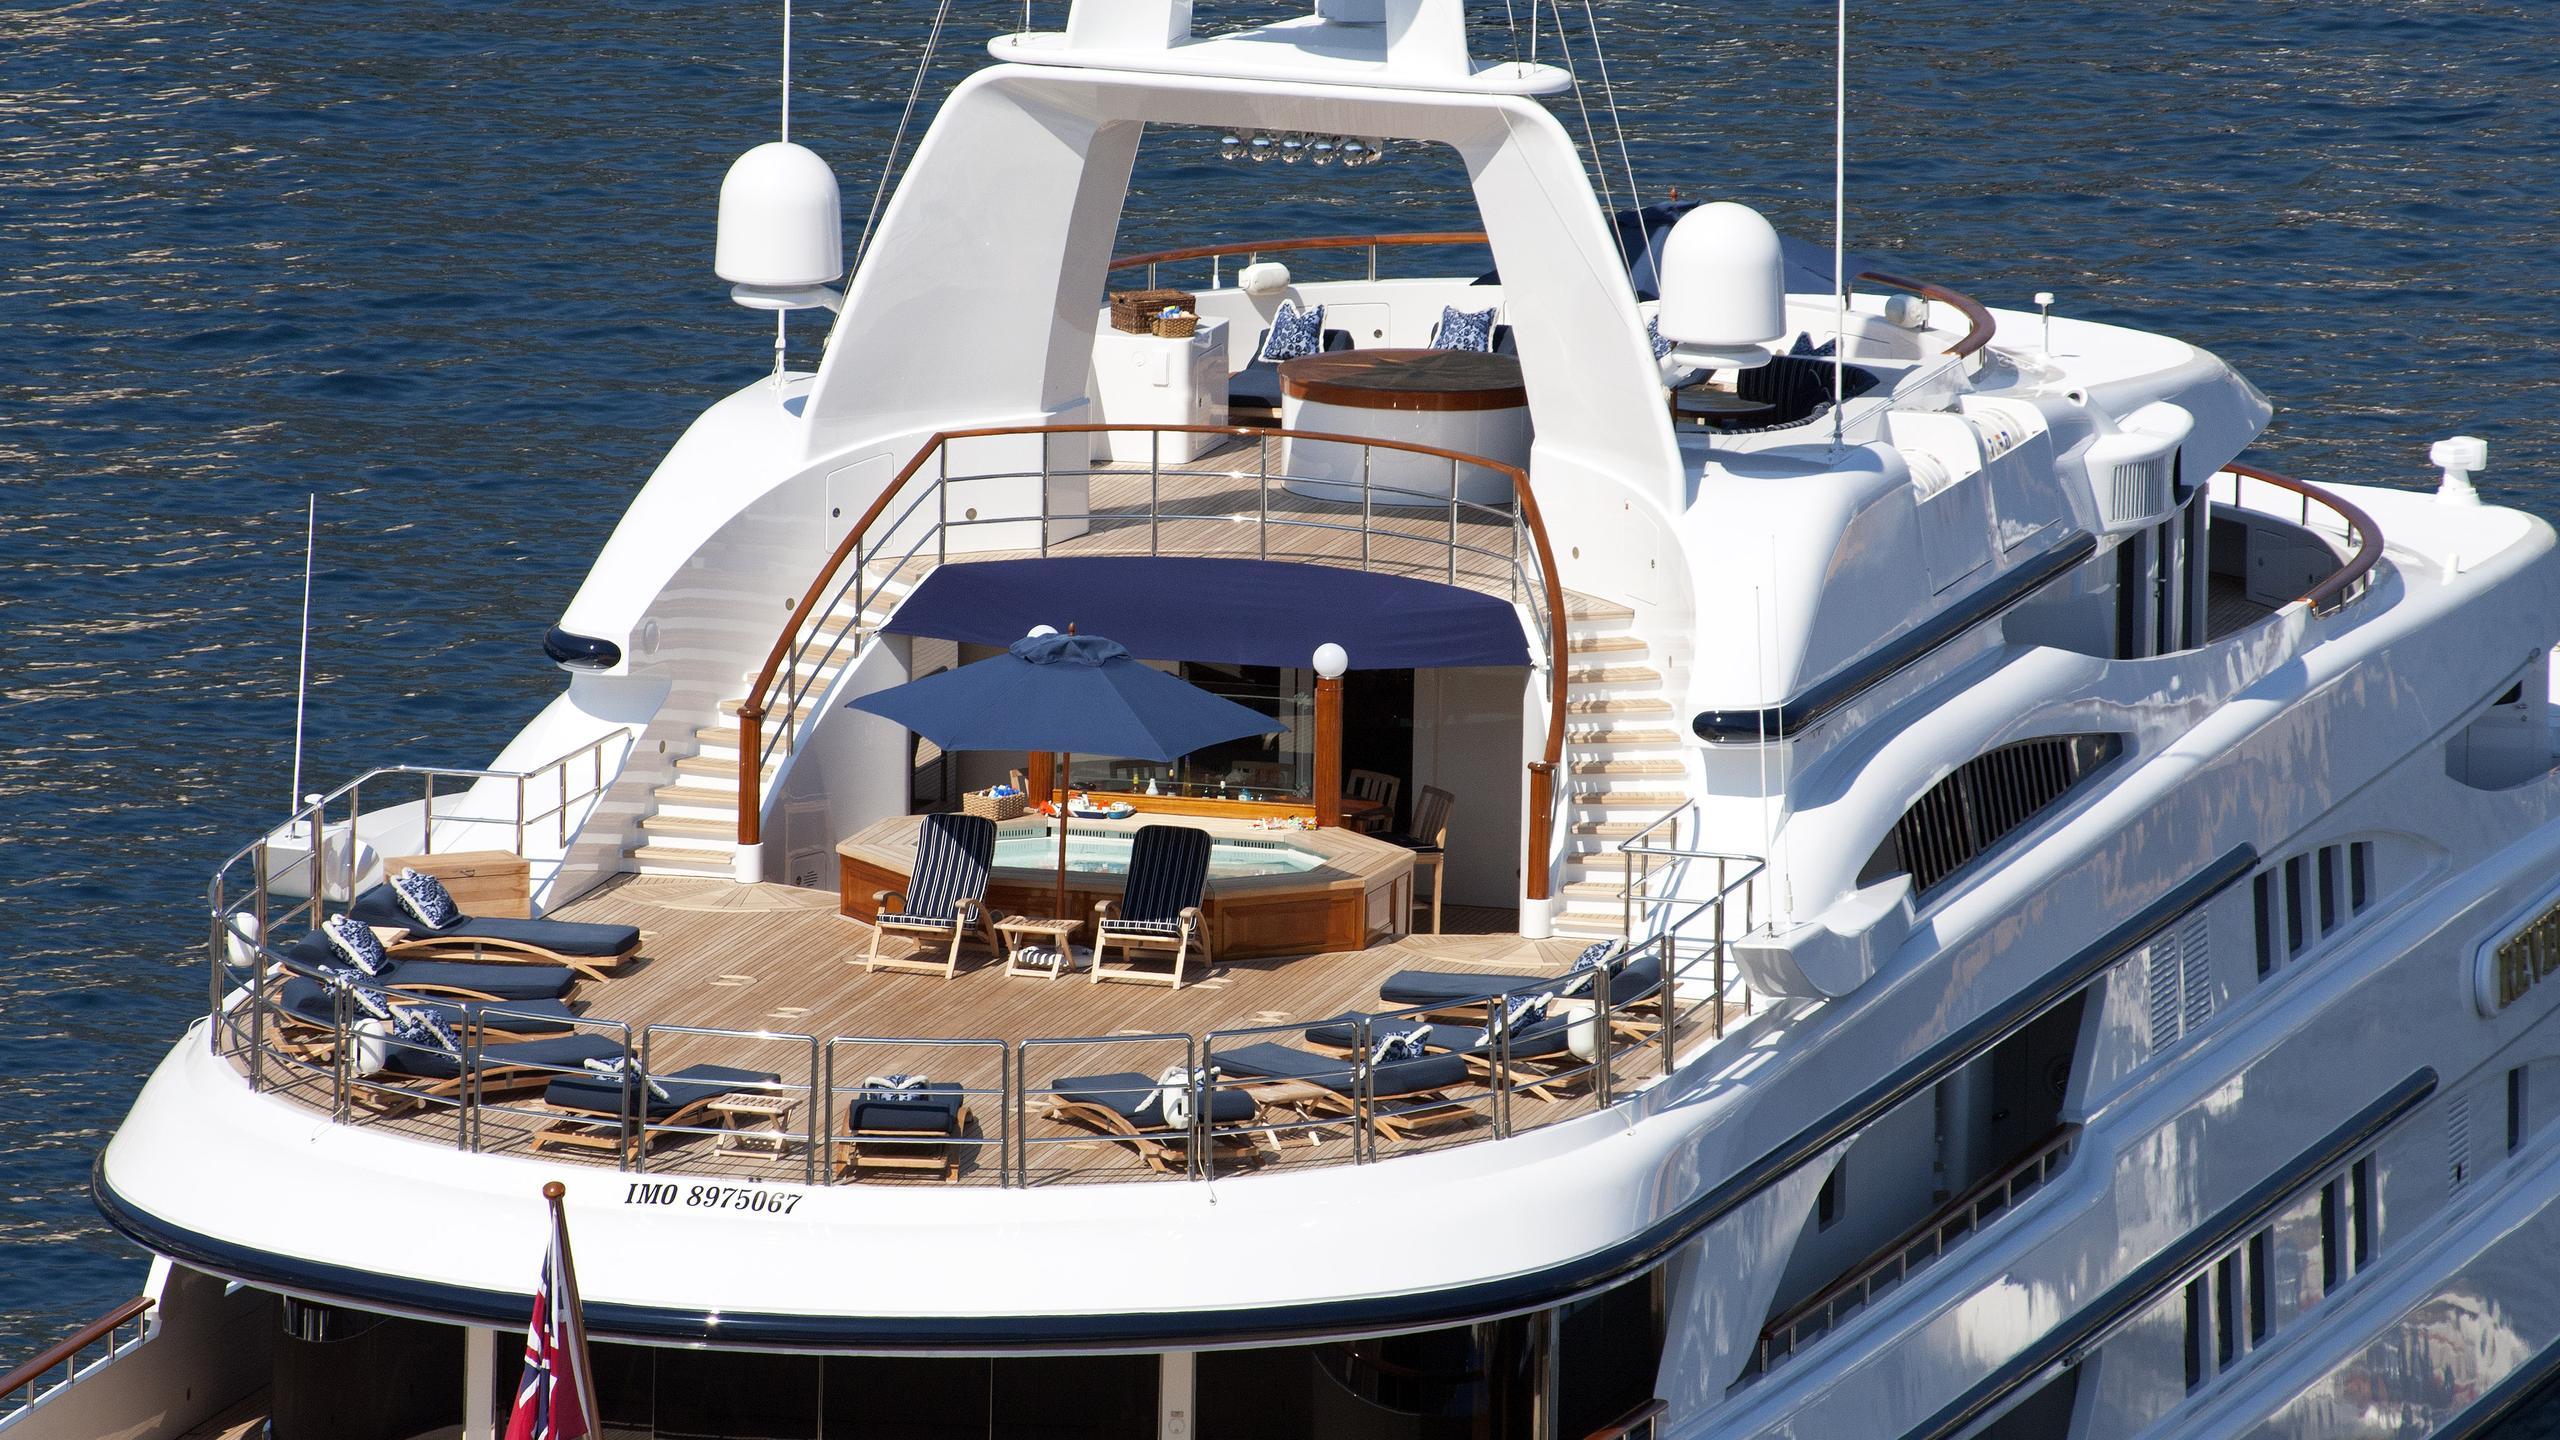 freedom-motor-yachtbenetti-2000-70m-sundeck-details